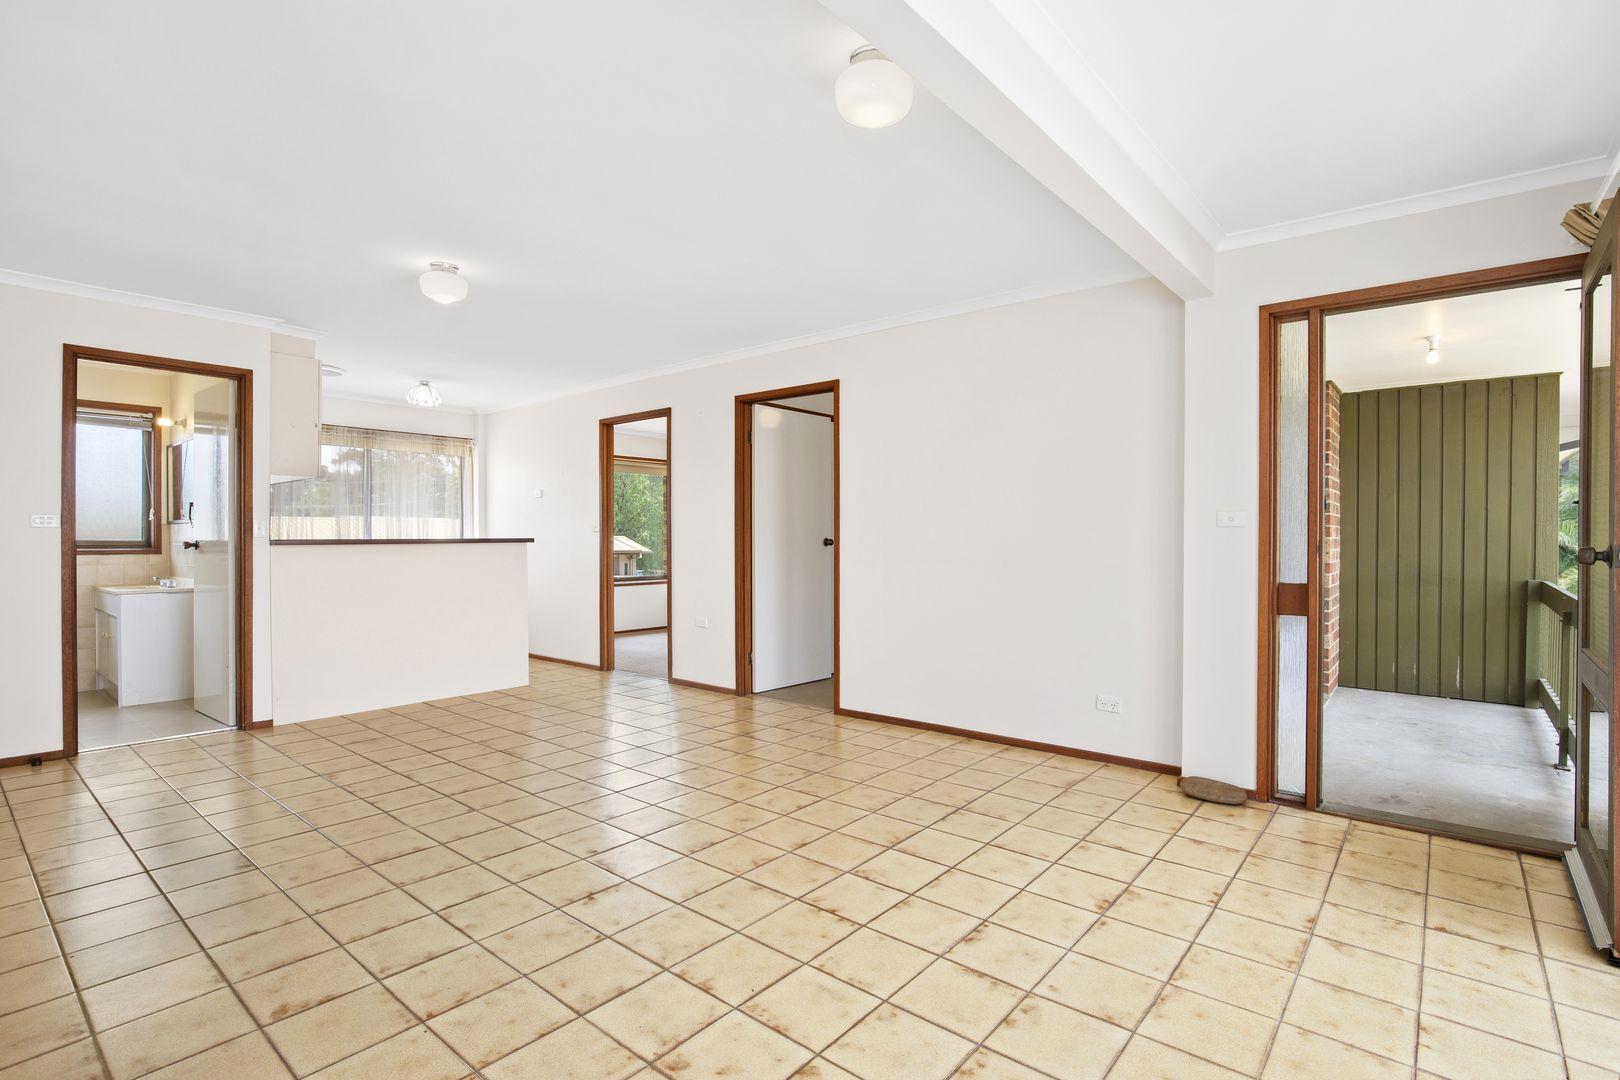 2/5 Avalon Street, Batemans Bay NSW 2536, Image 2